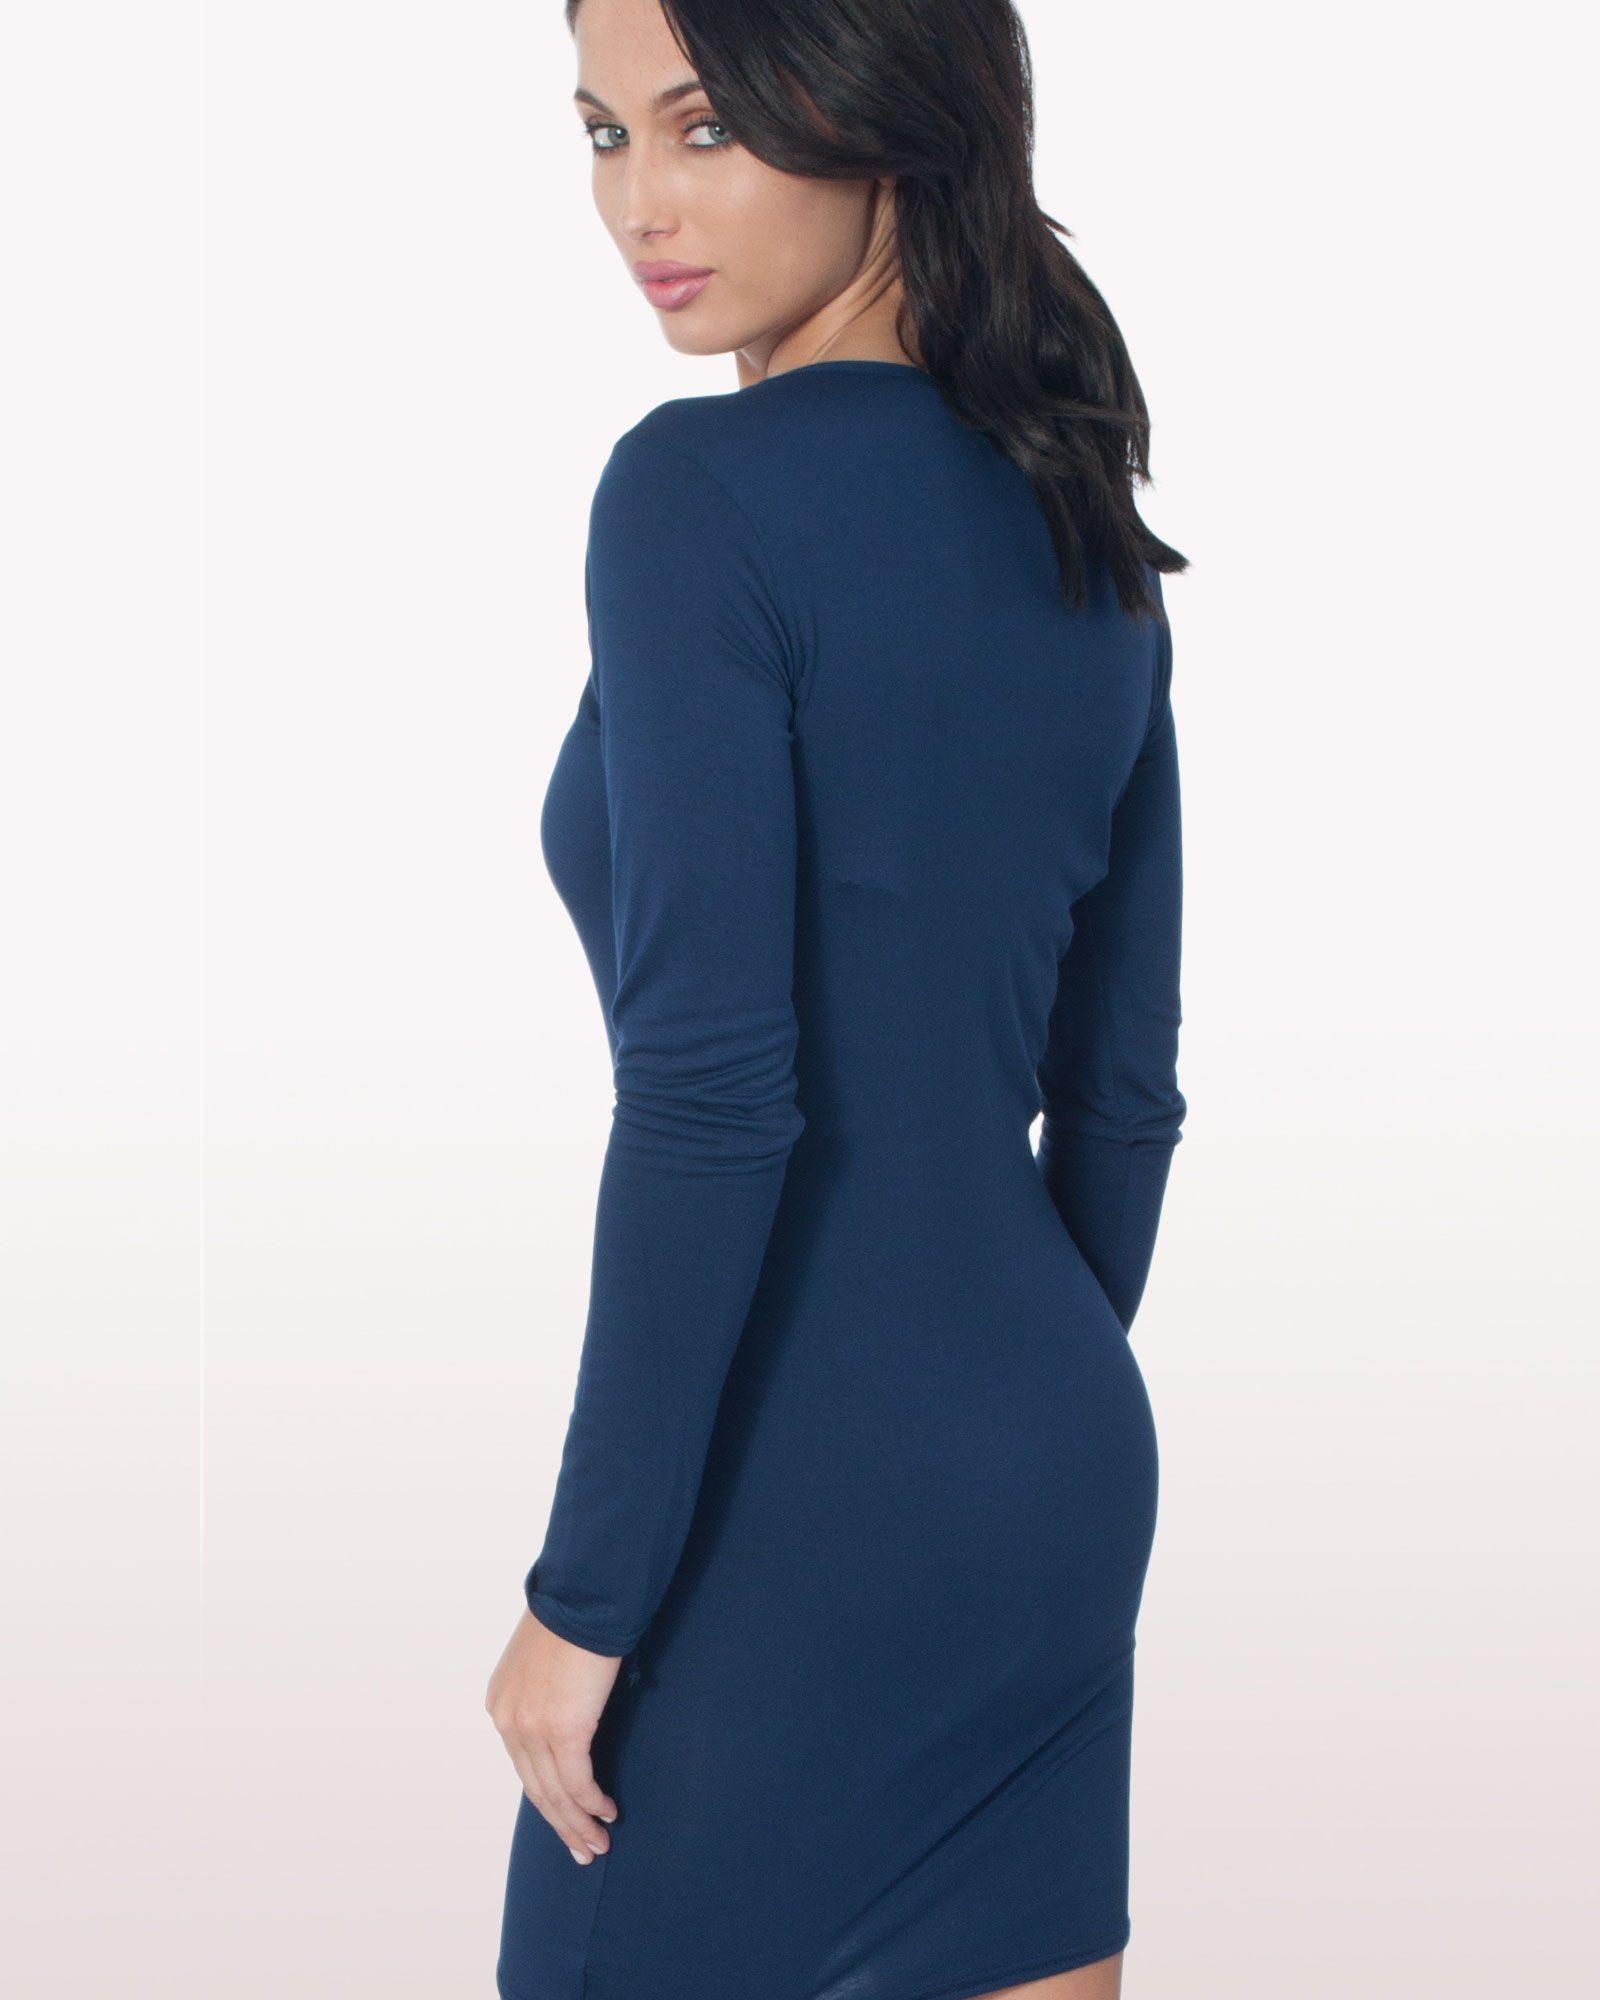 X ray dresses long sleeve bodycon asda